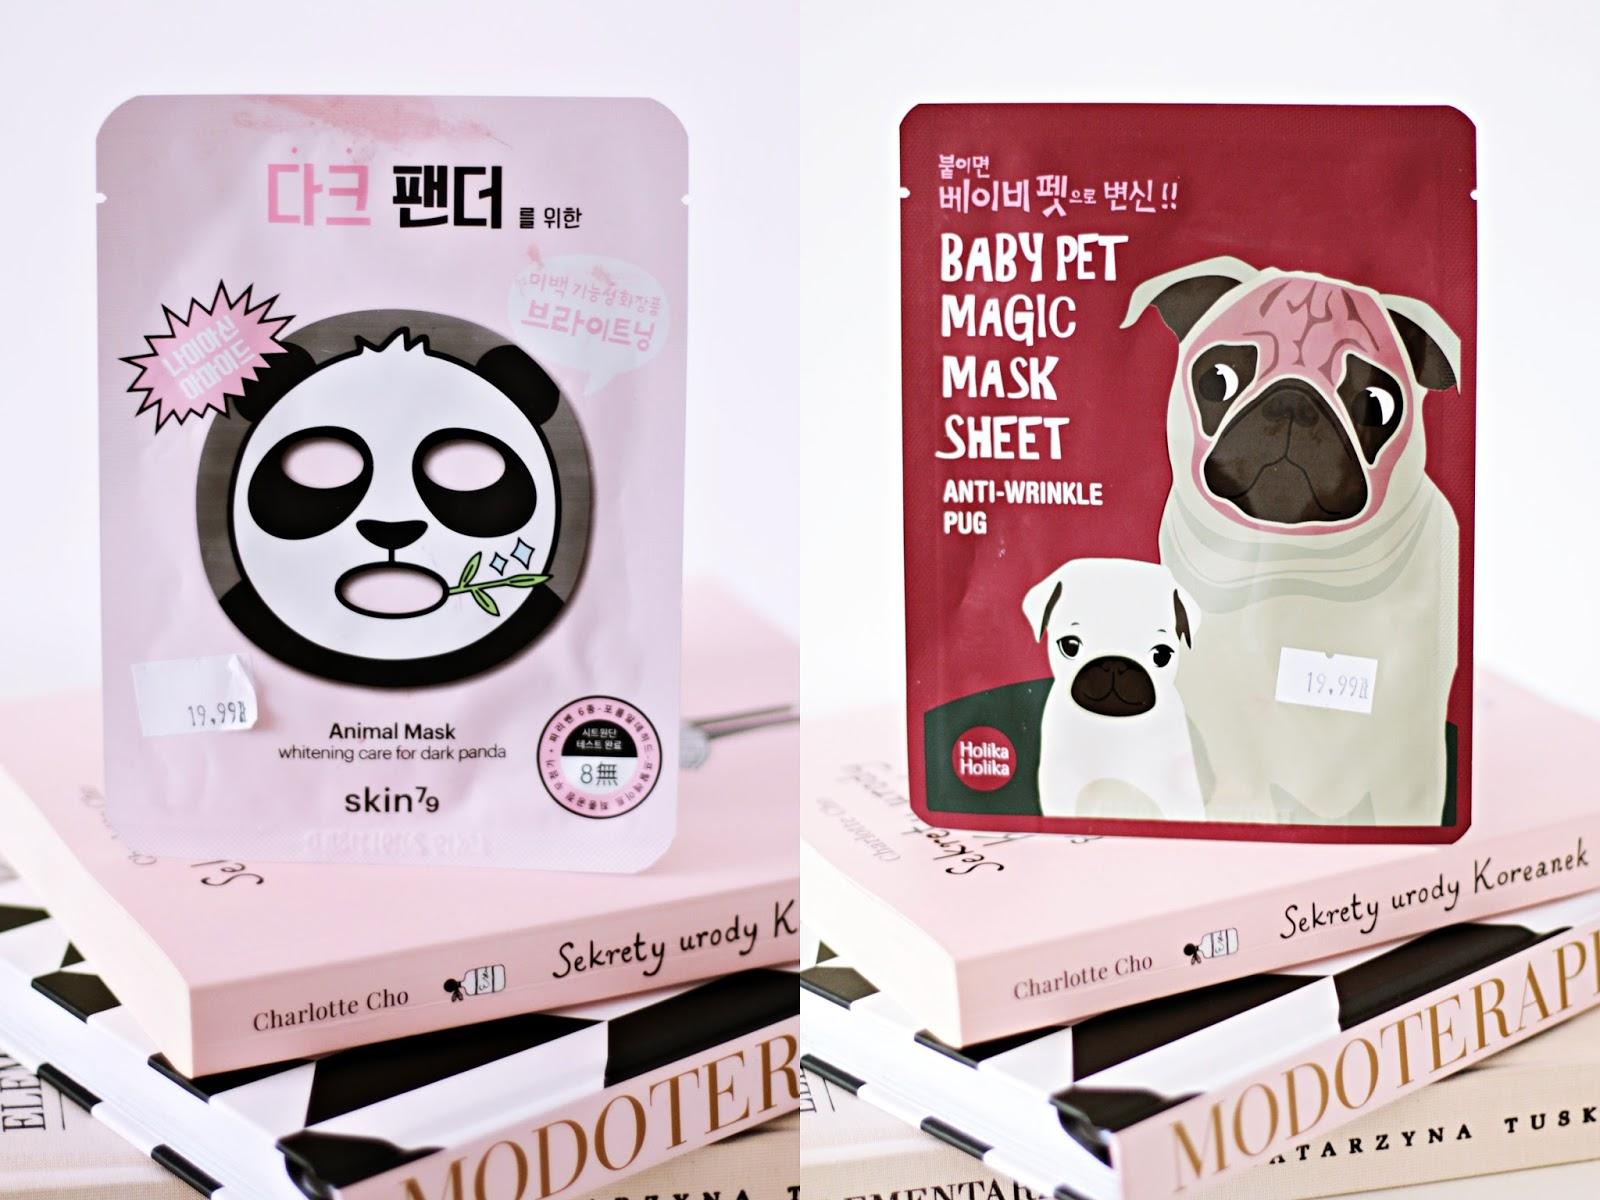 maska panda koreanska opinie blog